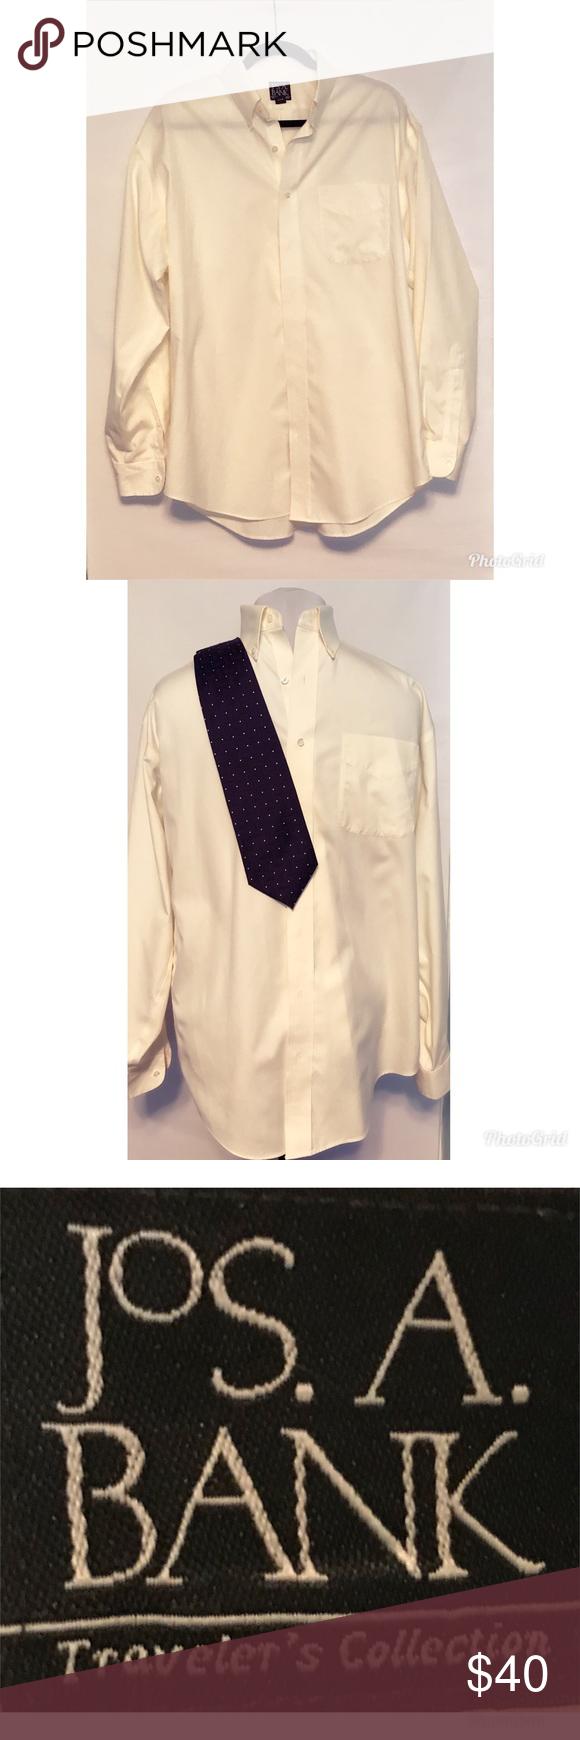 Jos A Bank Travelers Mens Dress Shirt Size 16 35 My Posh Closet